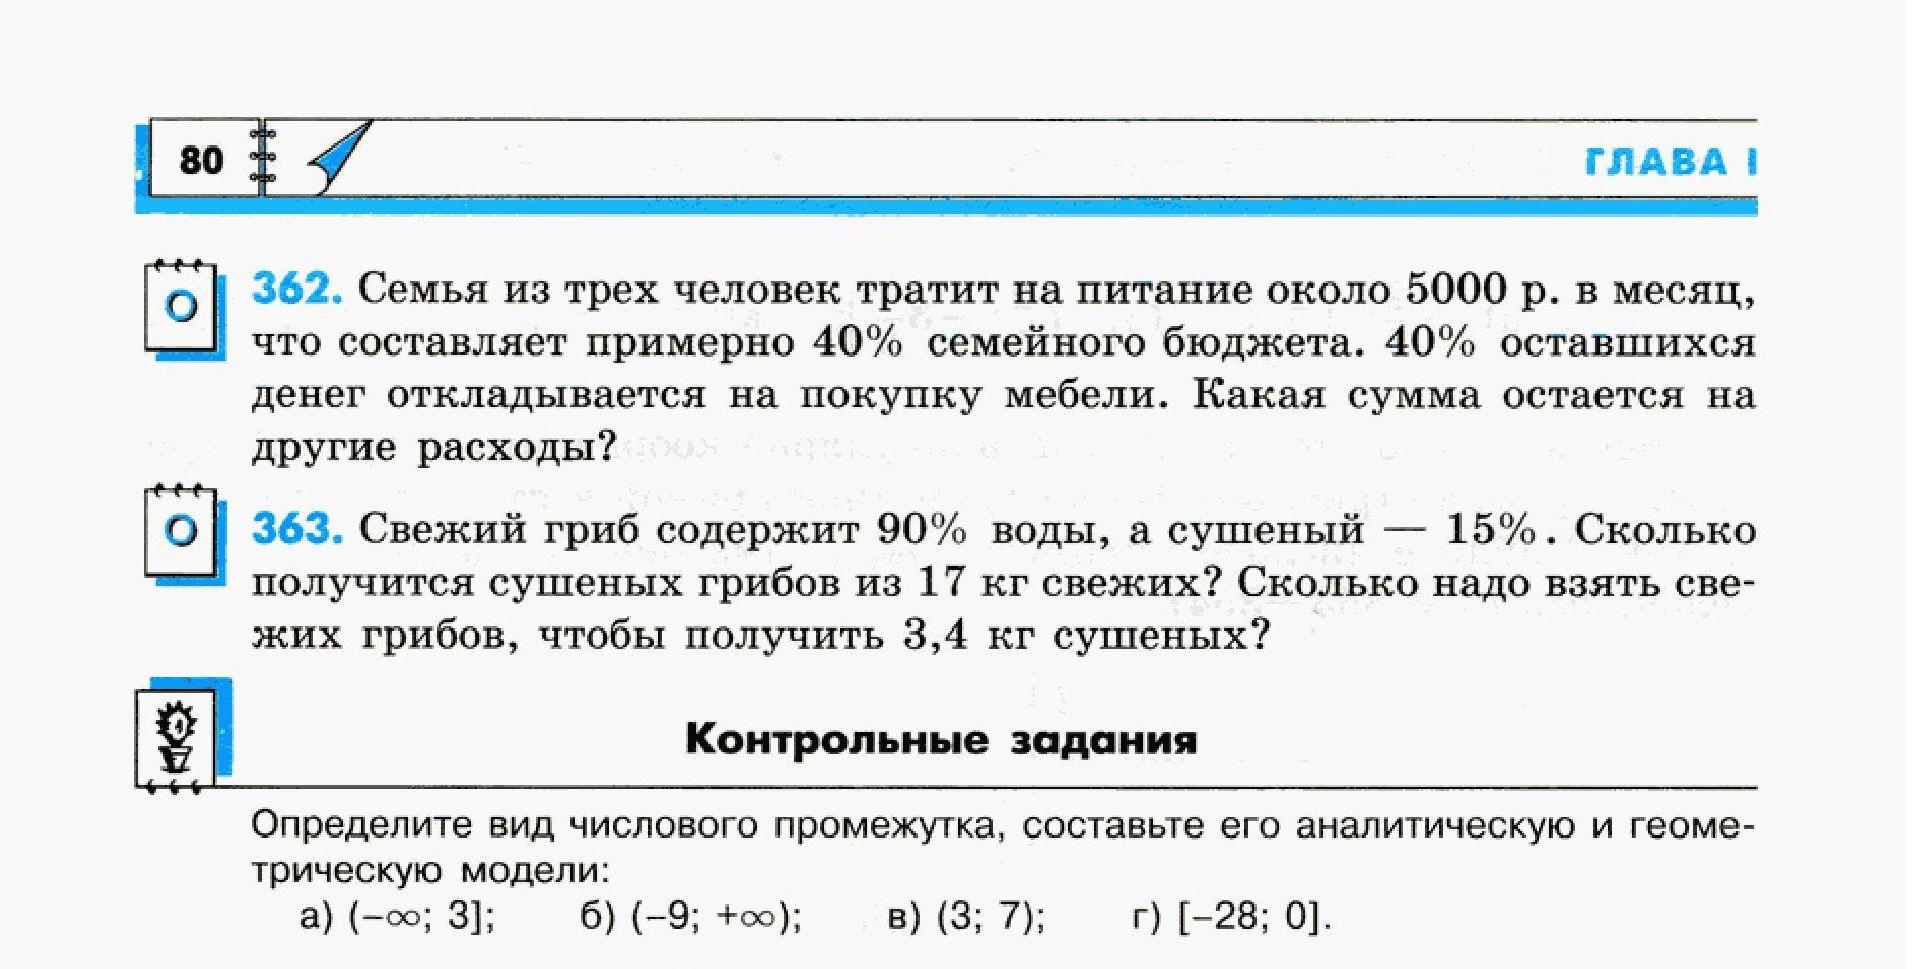 Гдз информатика 3 класс коршунова ответ